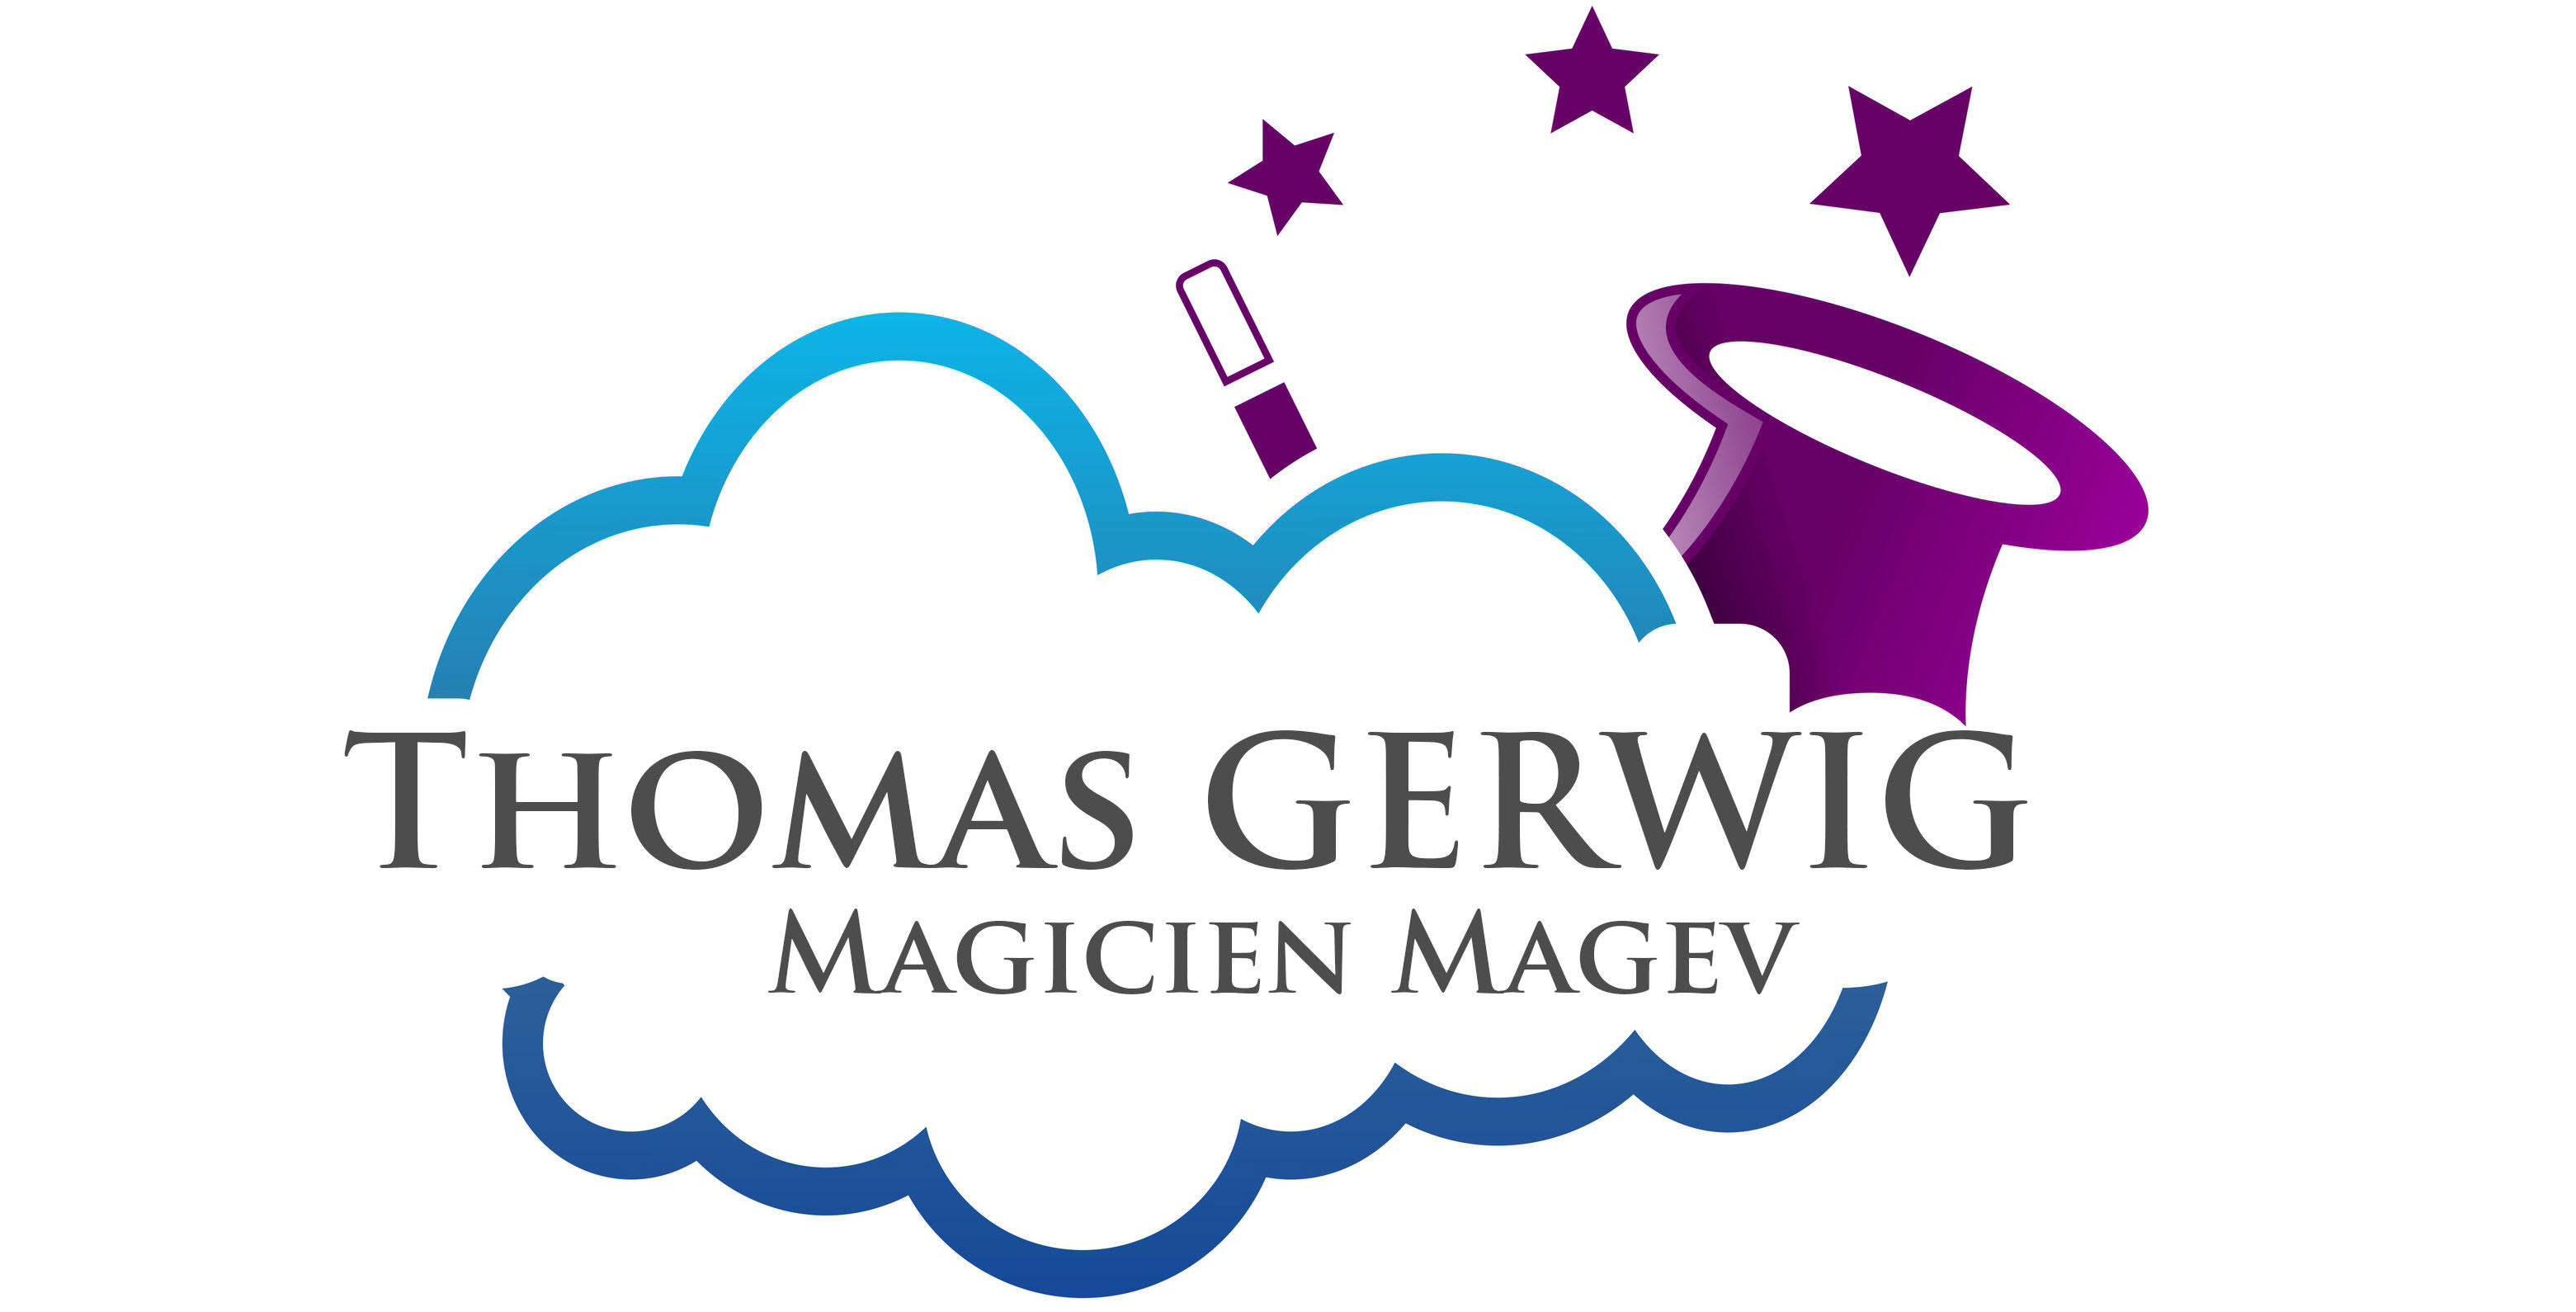 Thomas Gerwig